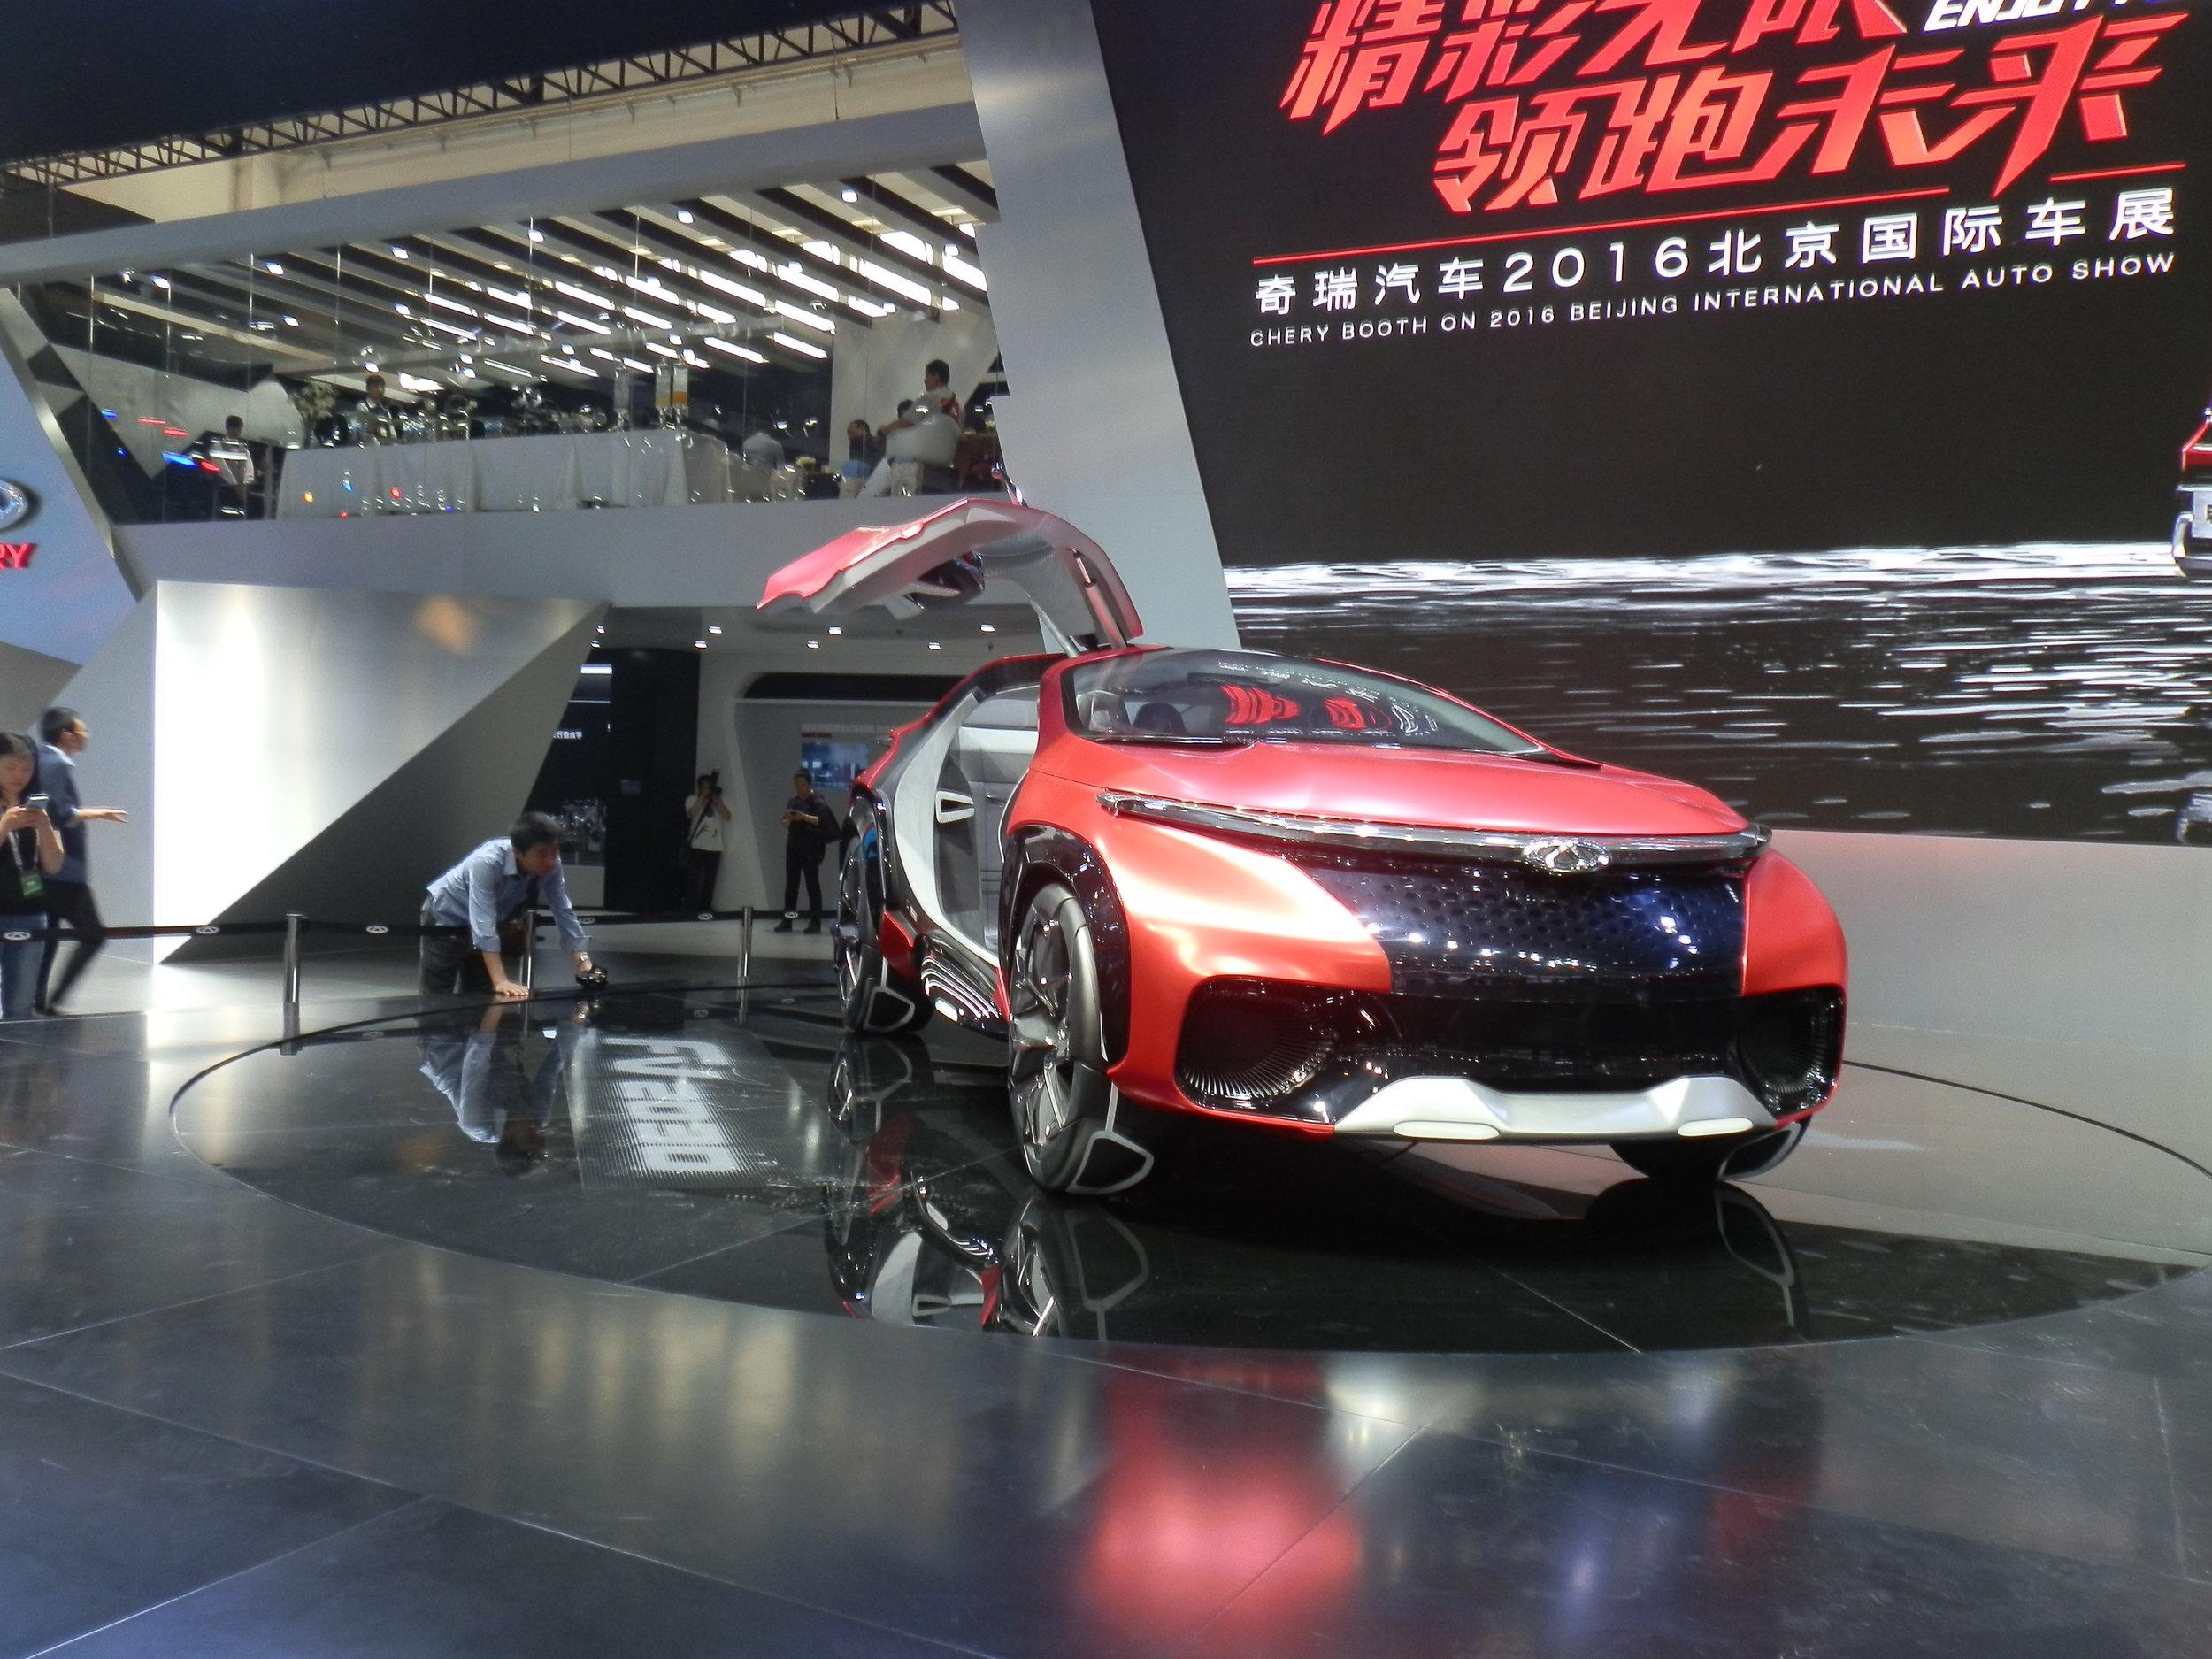 Beijing Auto Show 2016 new model